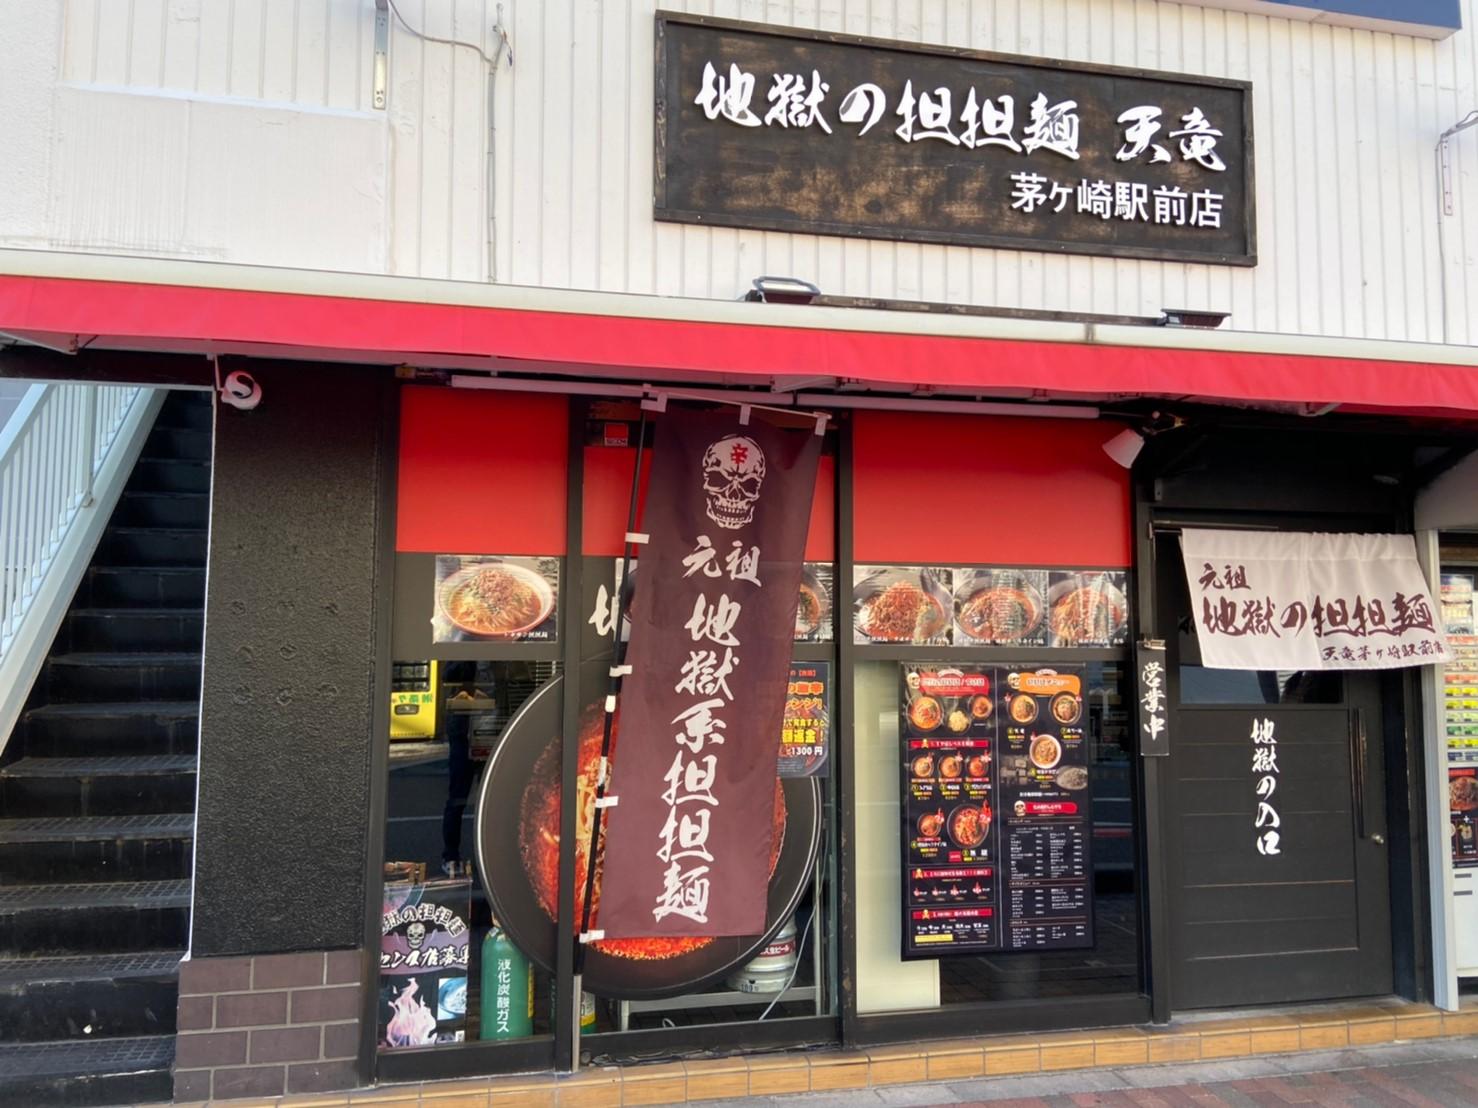 地獄の担担麺 天竜茅ヶ崎駅前店